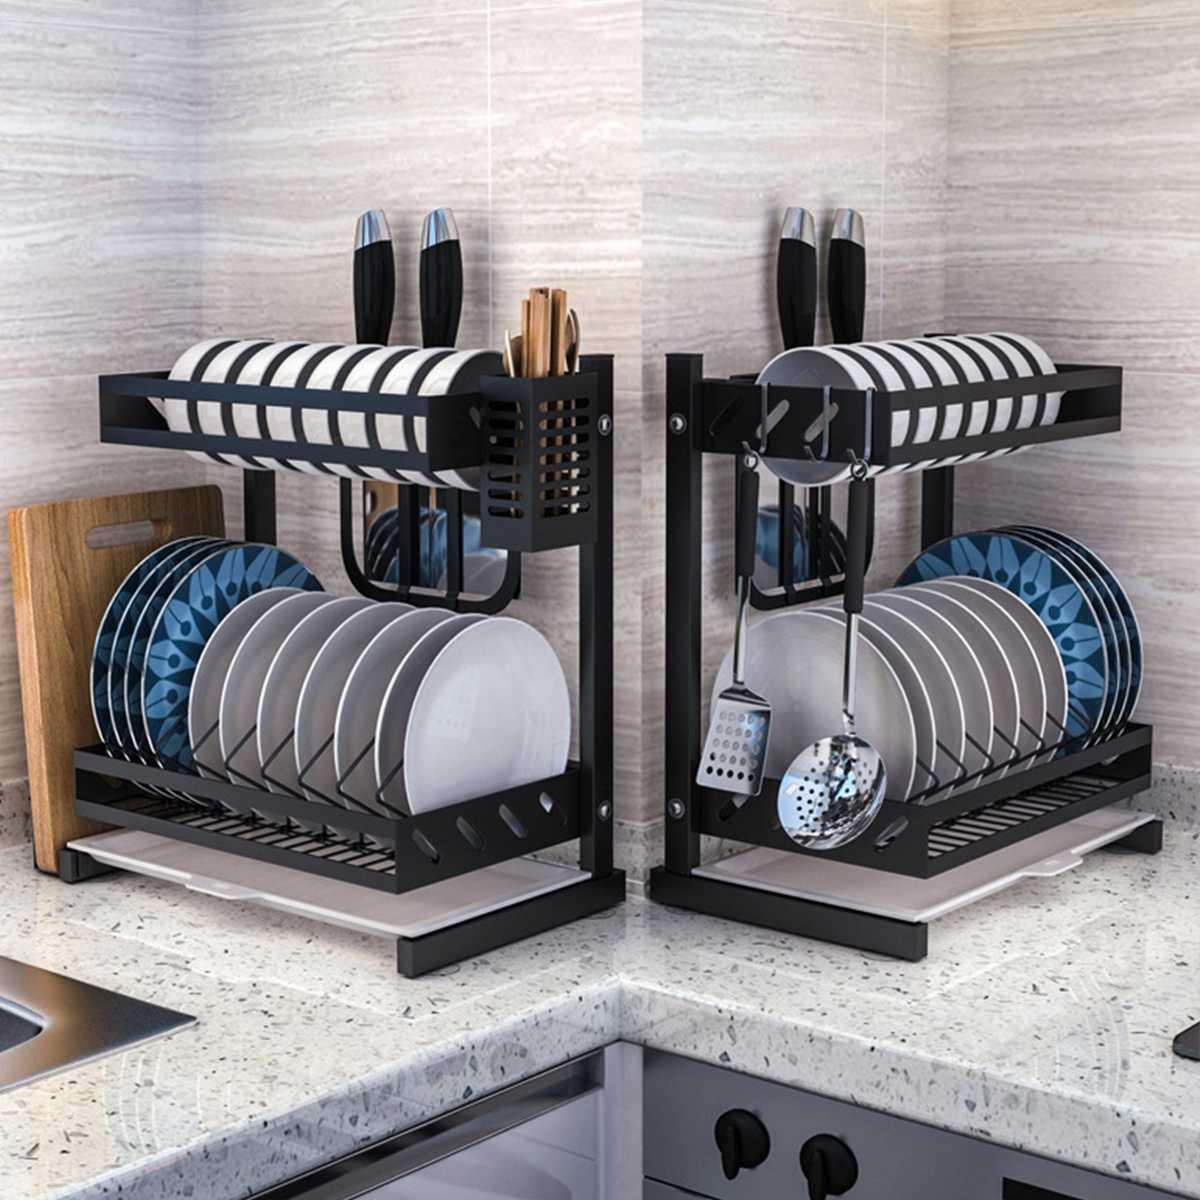 2 3 Layers Kitchen Shelf Organizer Dish Drying Rack Over Sink Utensils Holder Bowl Dish Draining Shelf Kitchen Storage Organizer Buy At The Price Of 58 99 In Aliexpress Com Imall Com